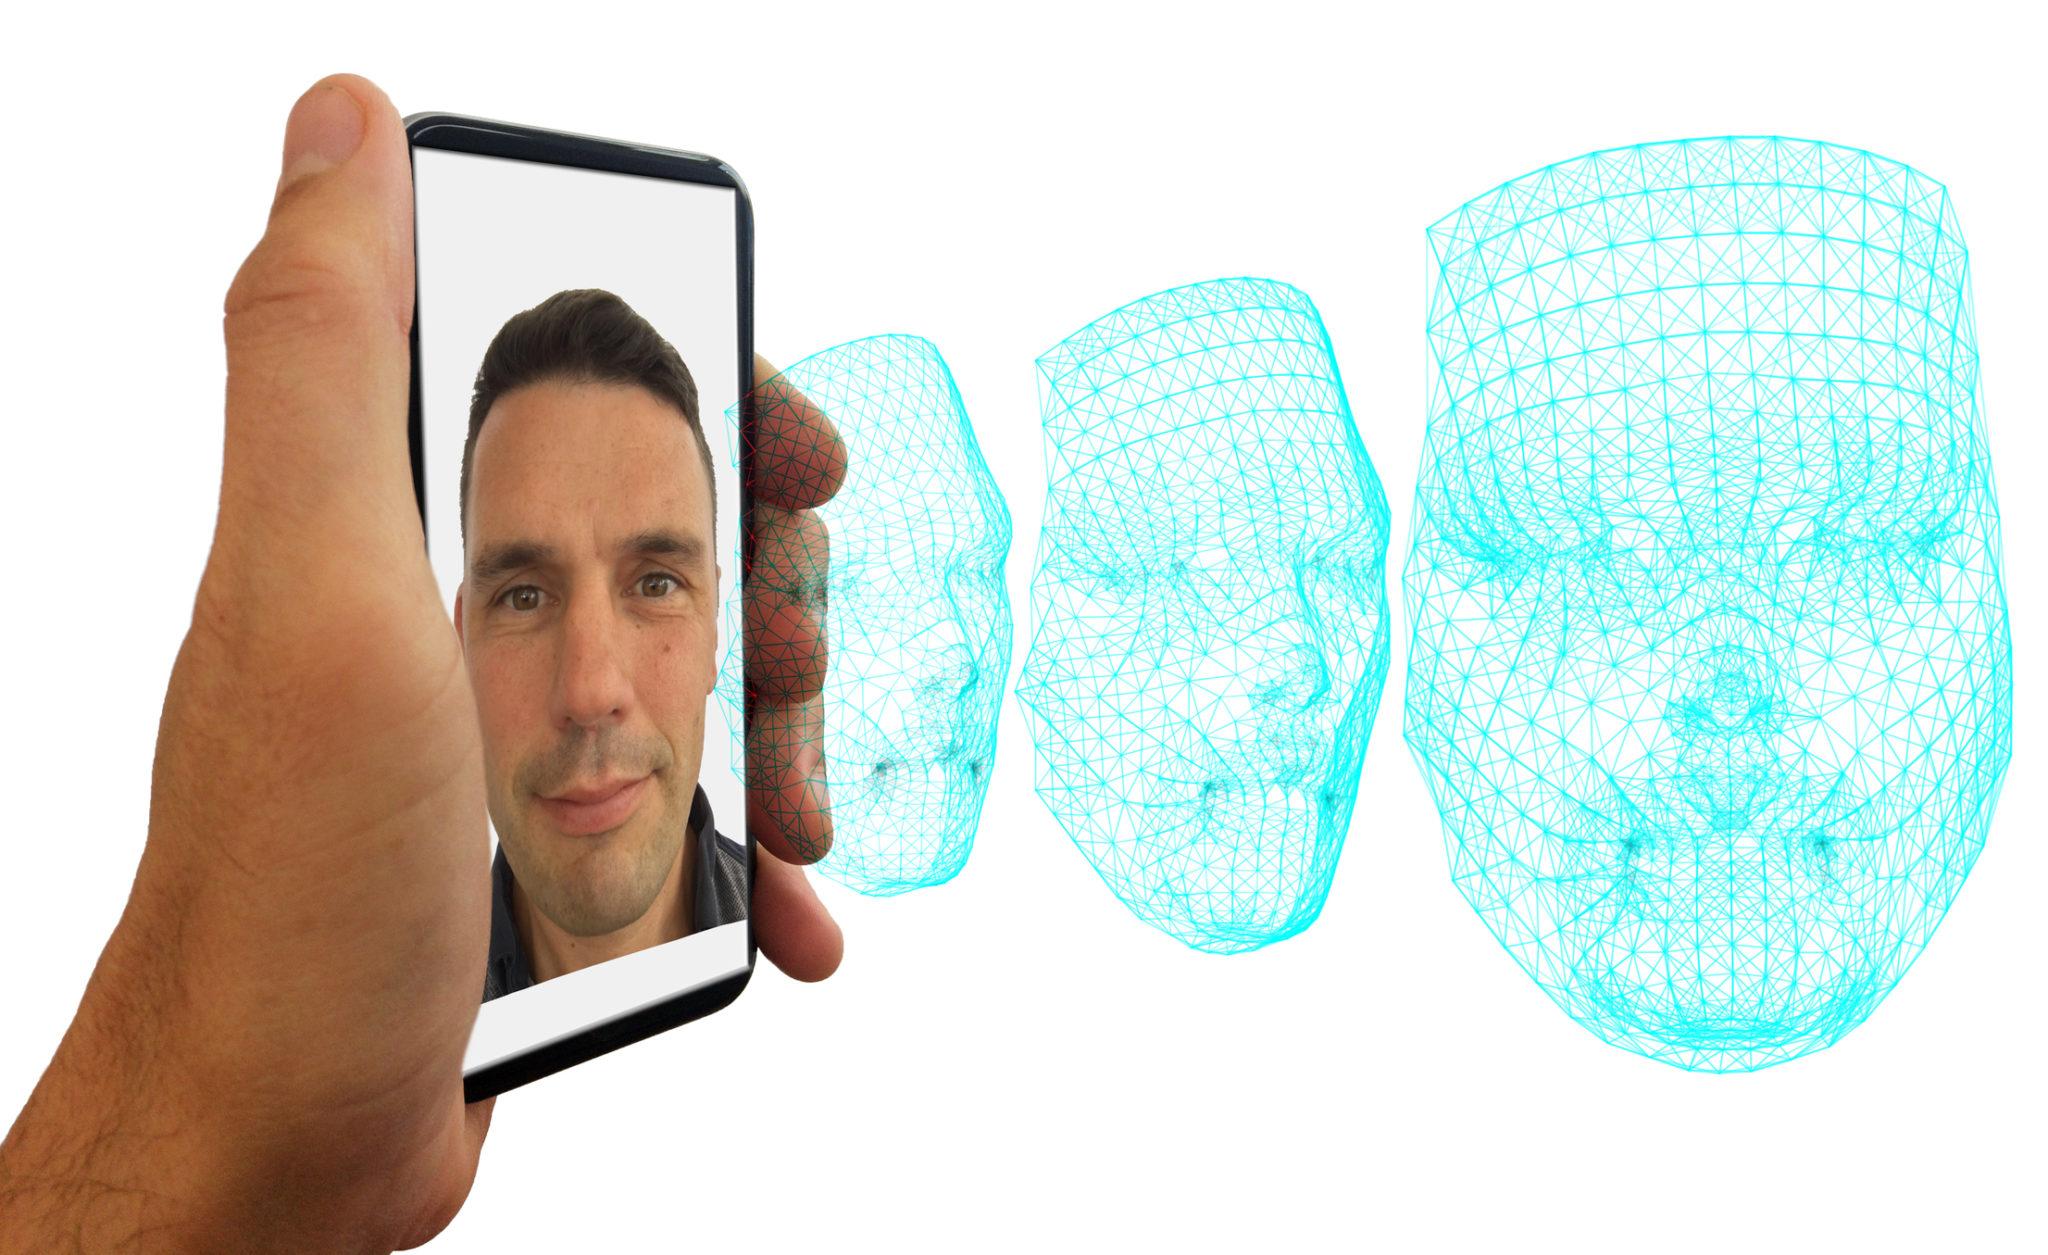 ARkit facial recognition